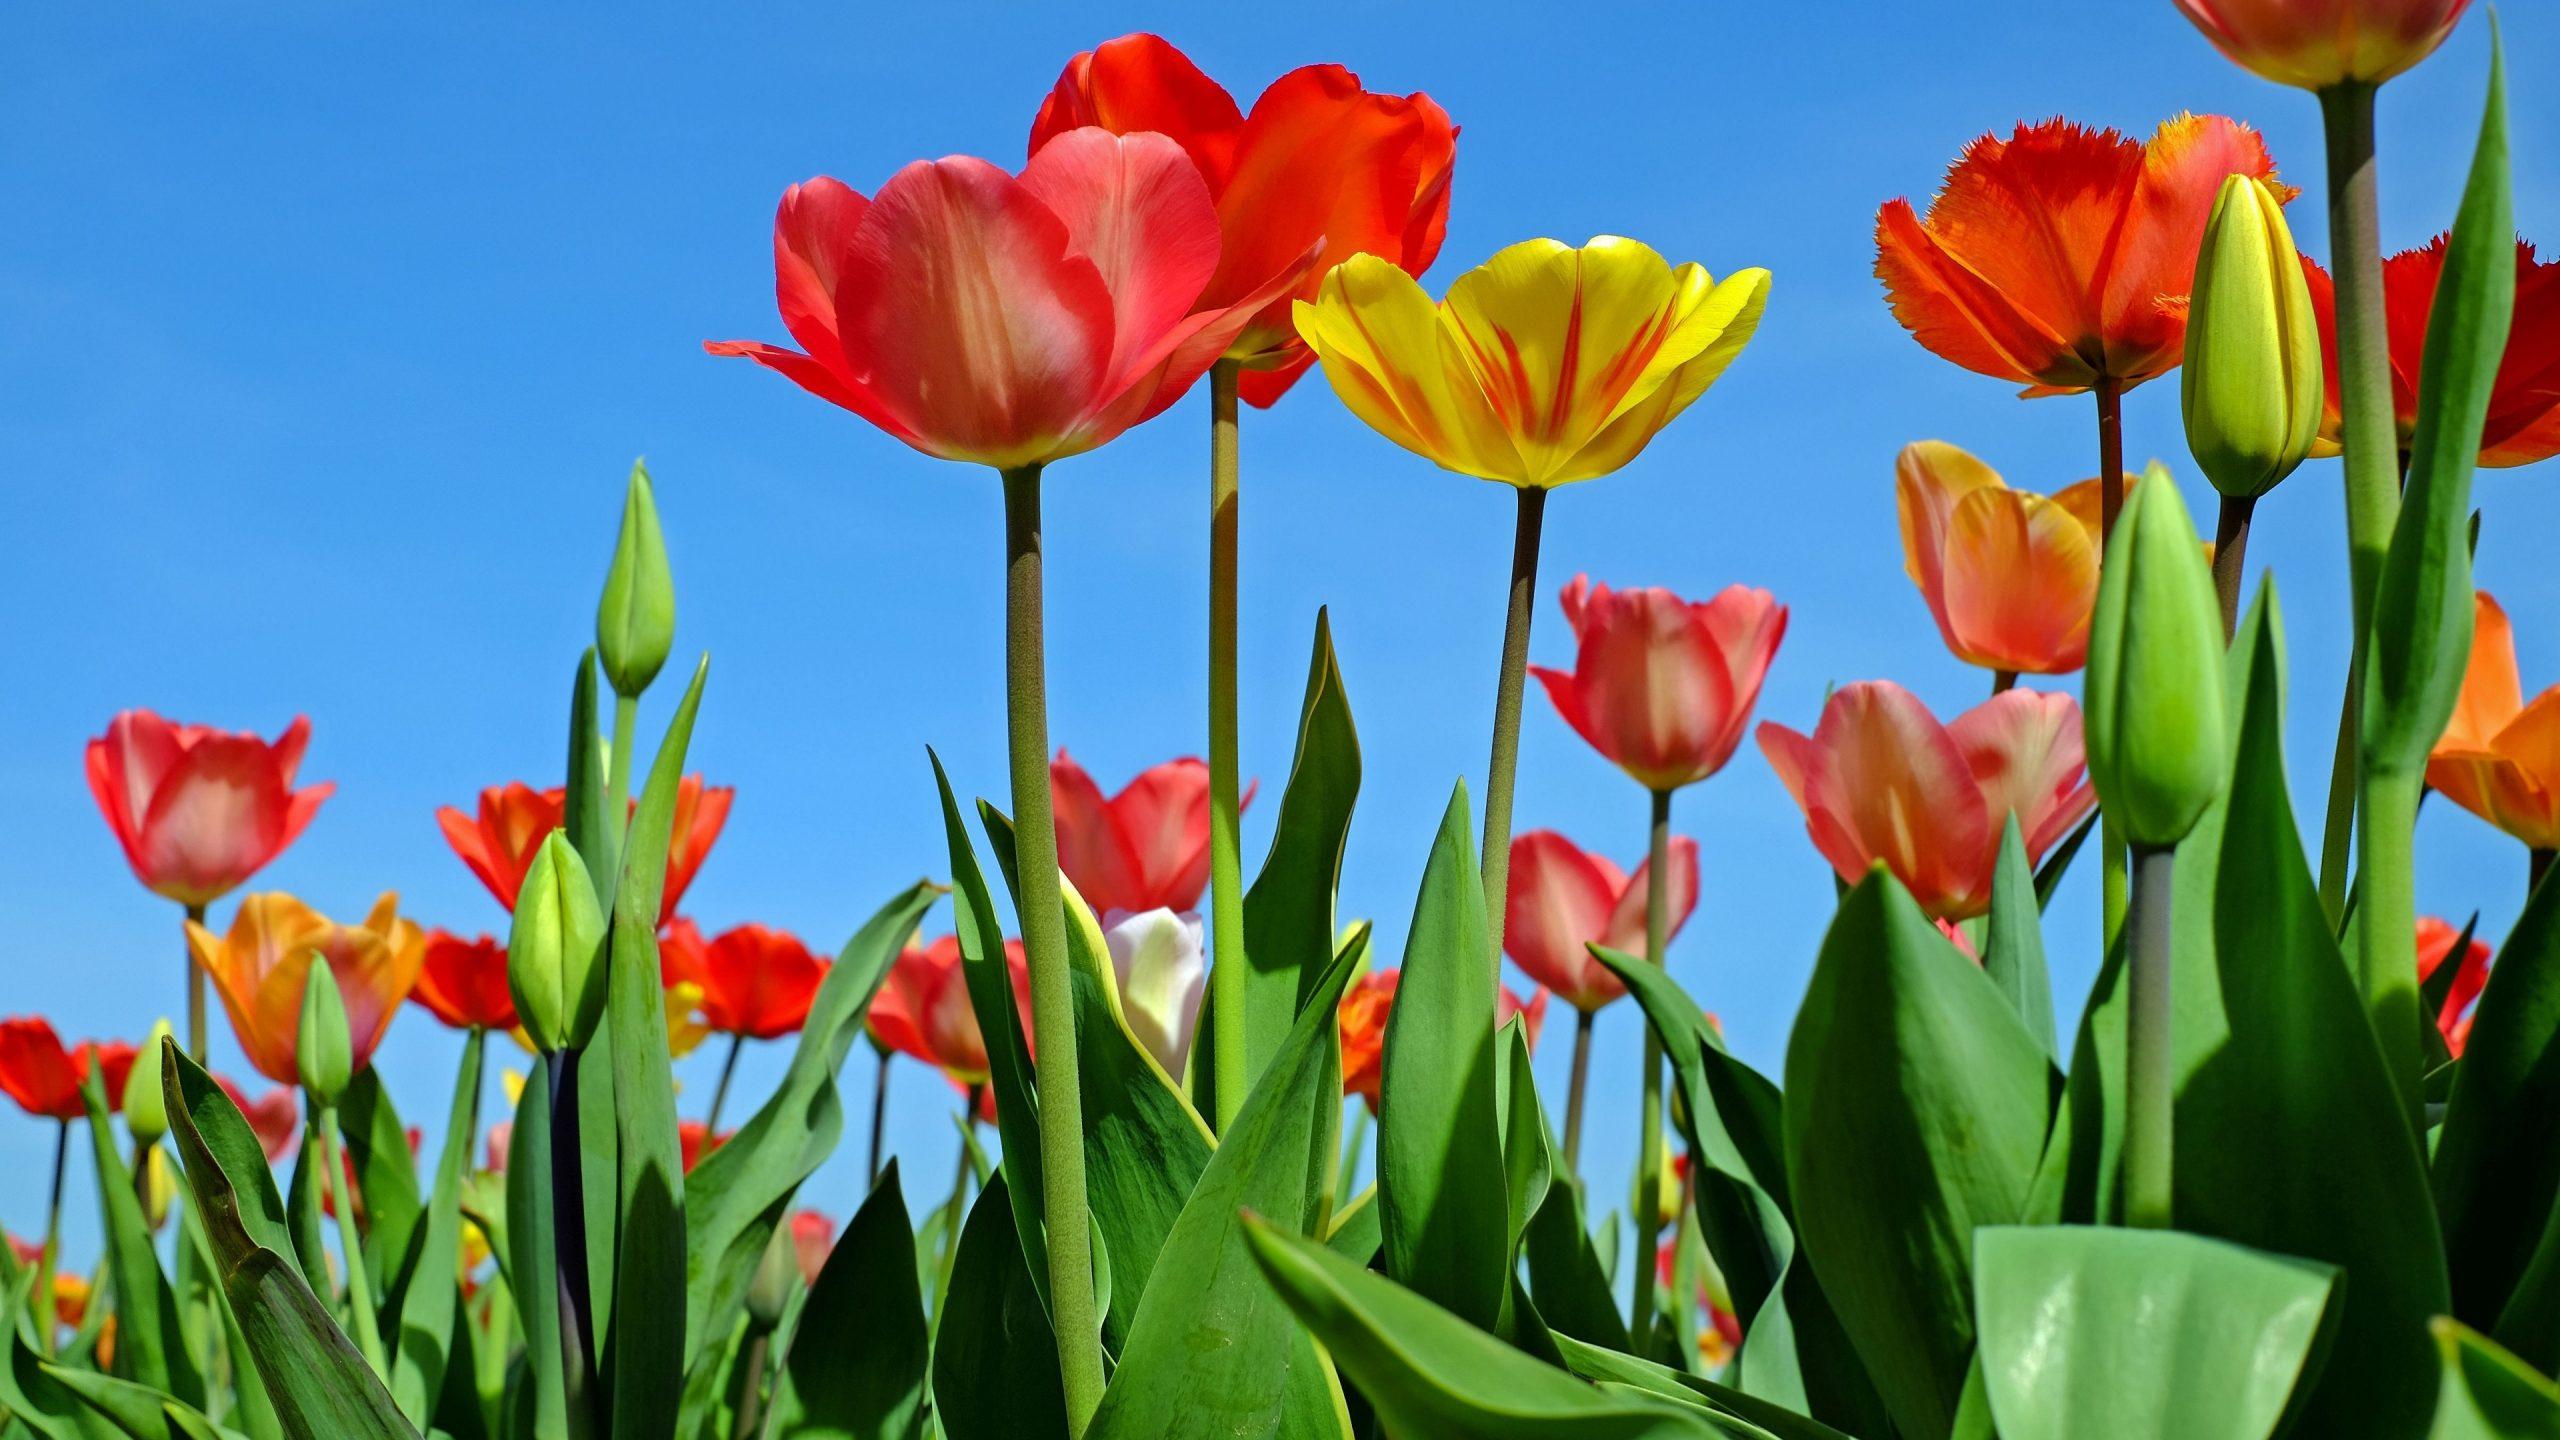 Tulips 4k wallpaper background hd wallpaper background - Background images 4k hd ...